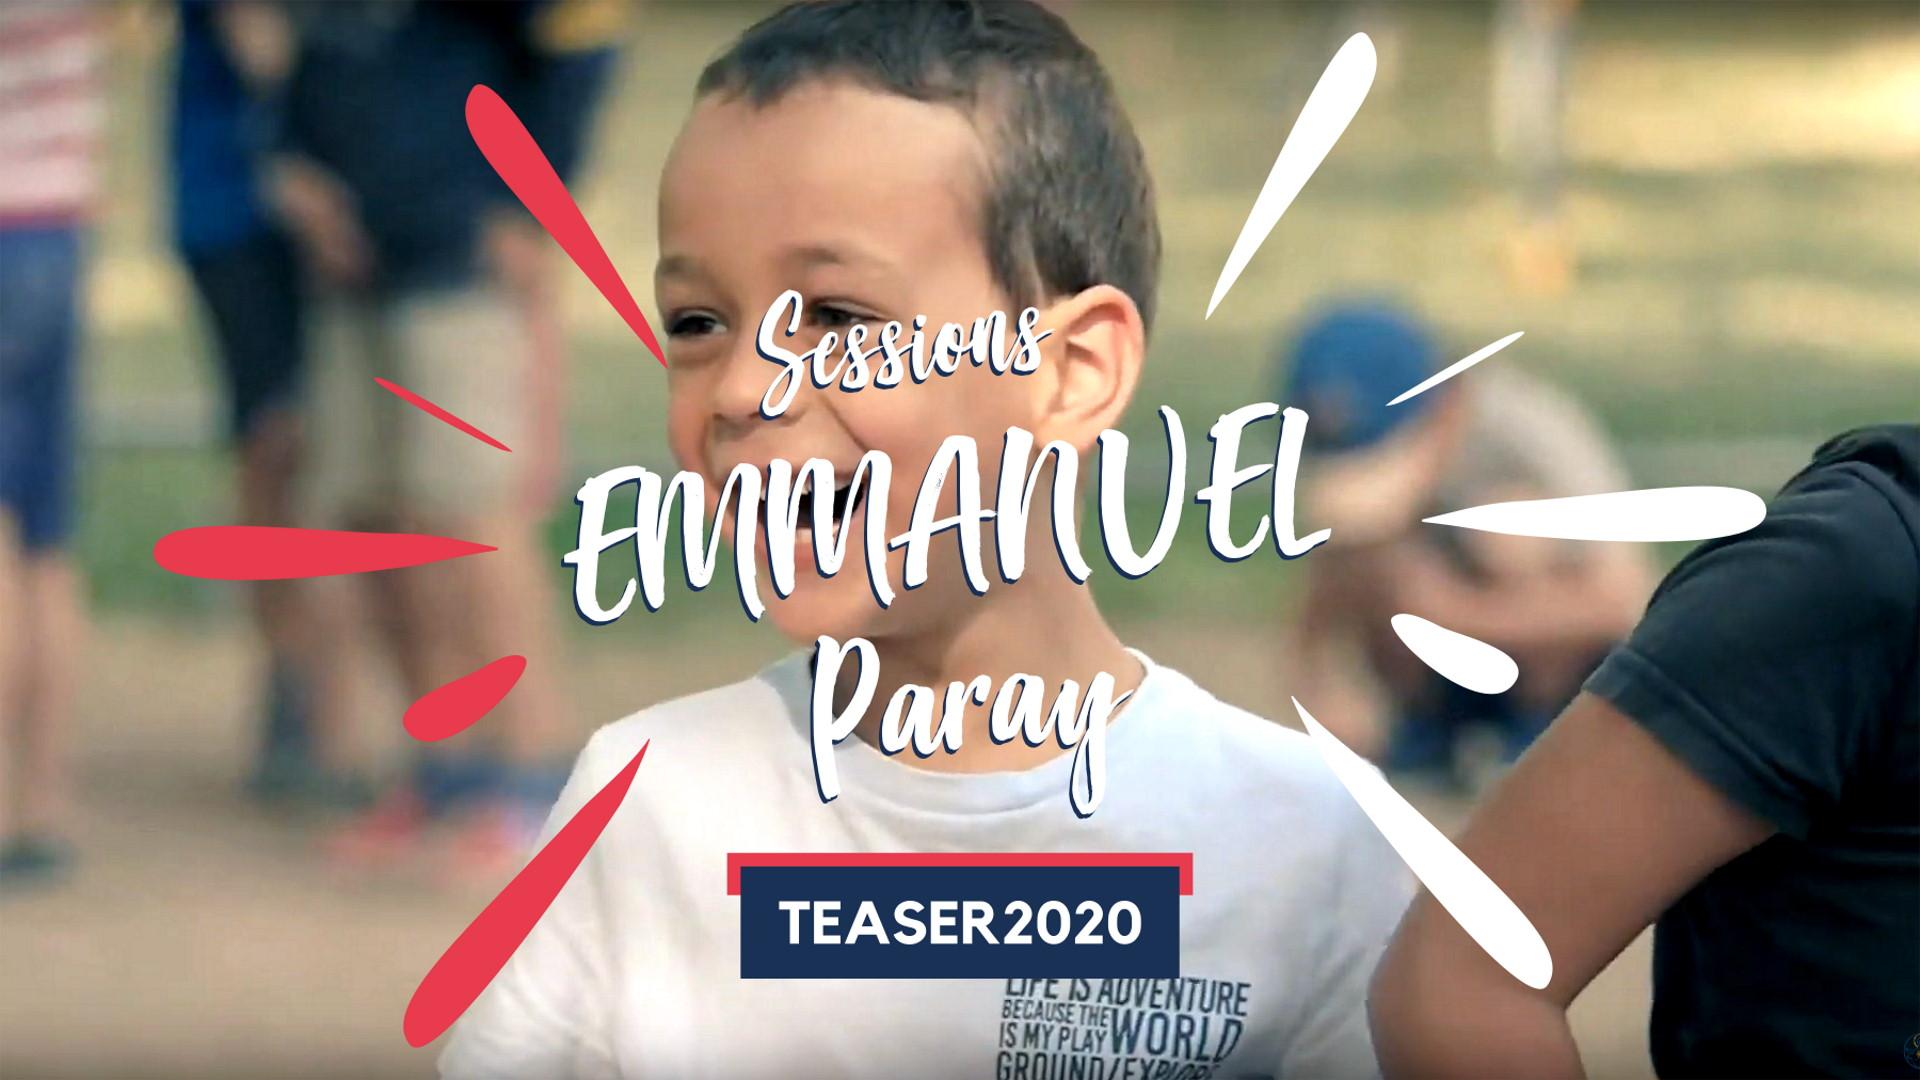 paray_teaser_2020.jpg